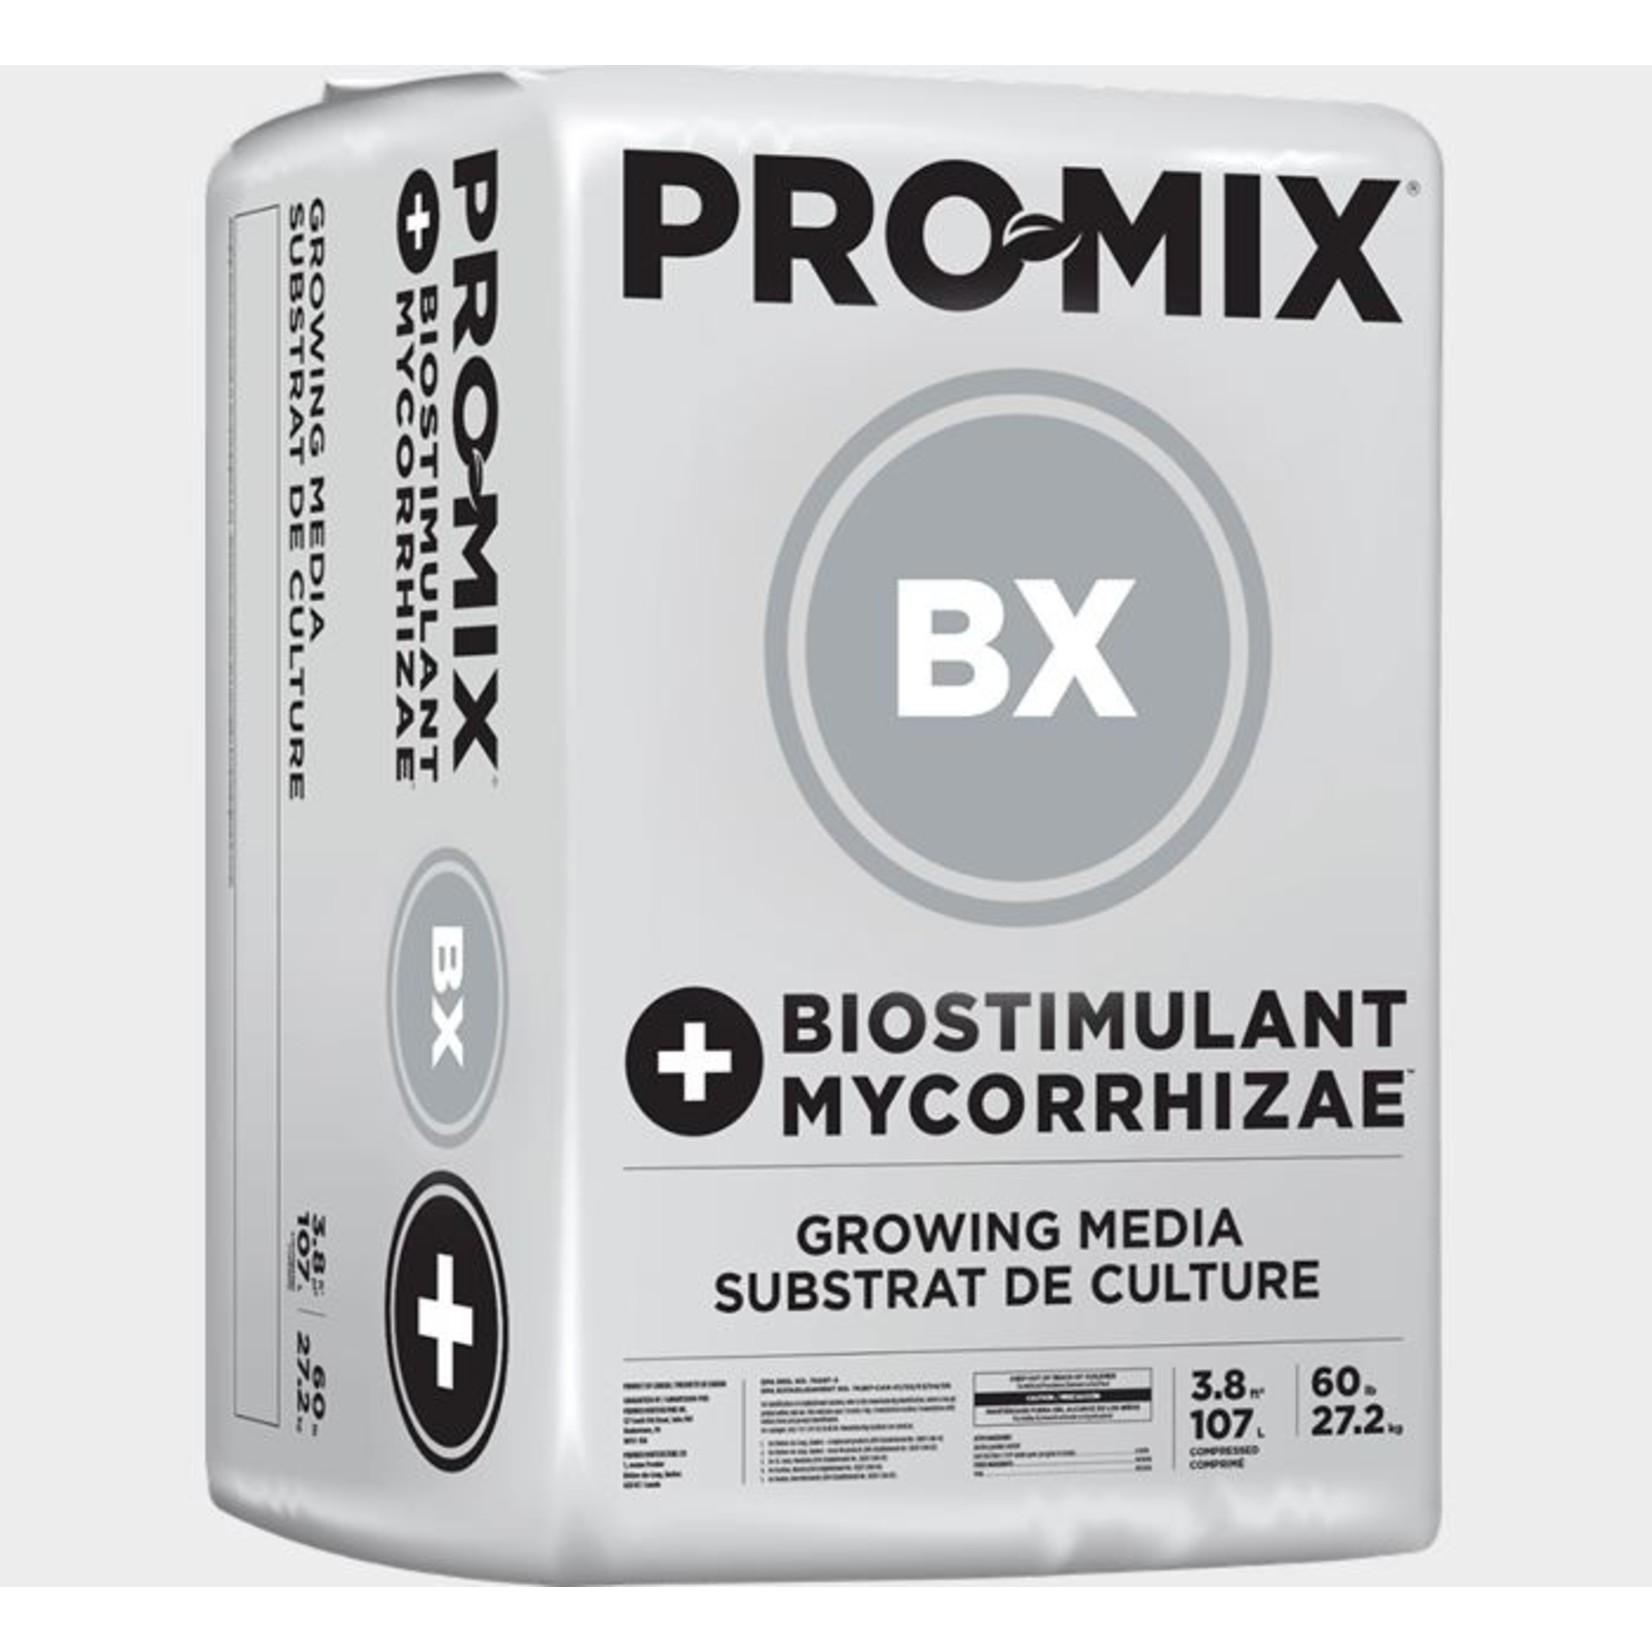 Promix PROMIX BX BIOSTIMULANT + MYCORRHIZAE